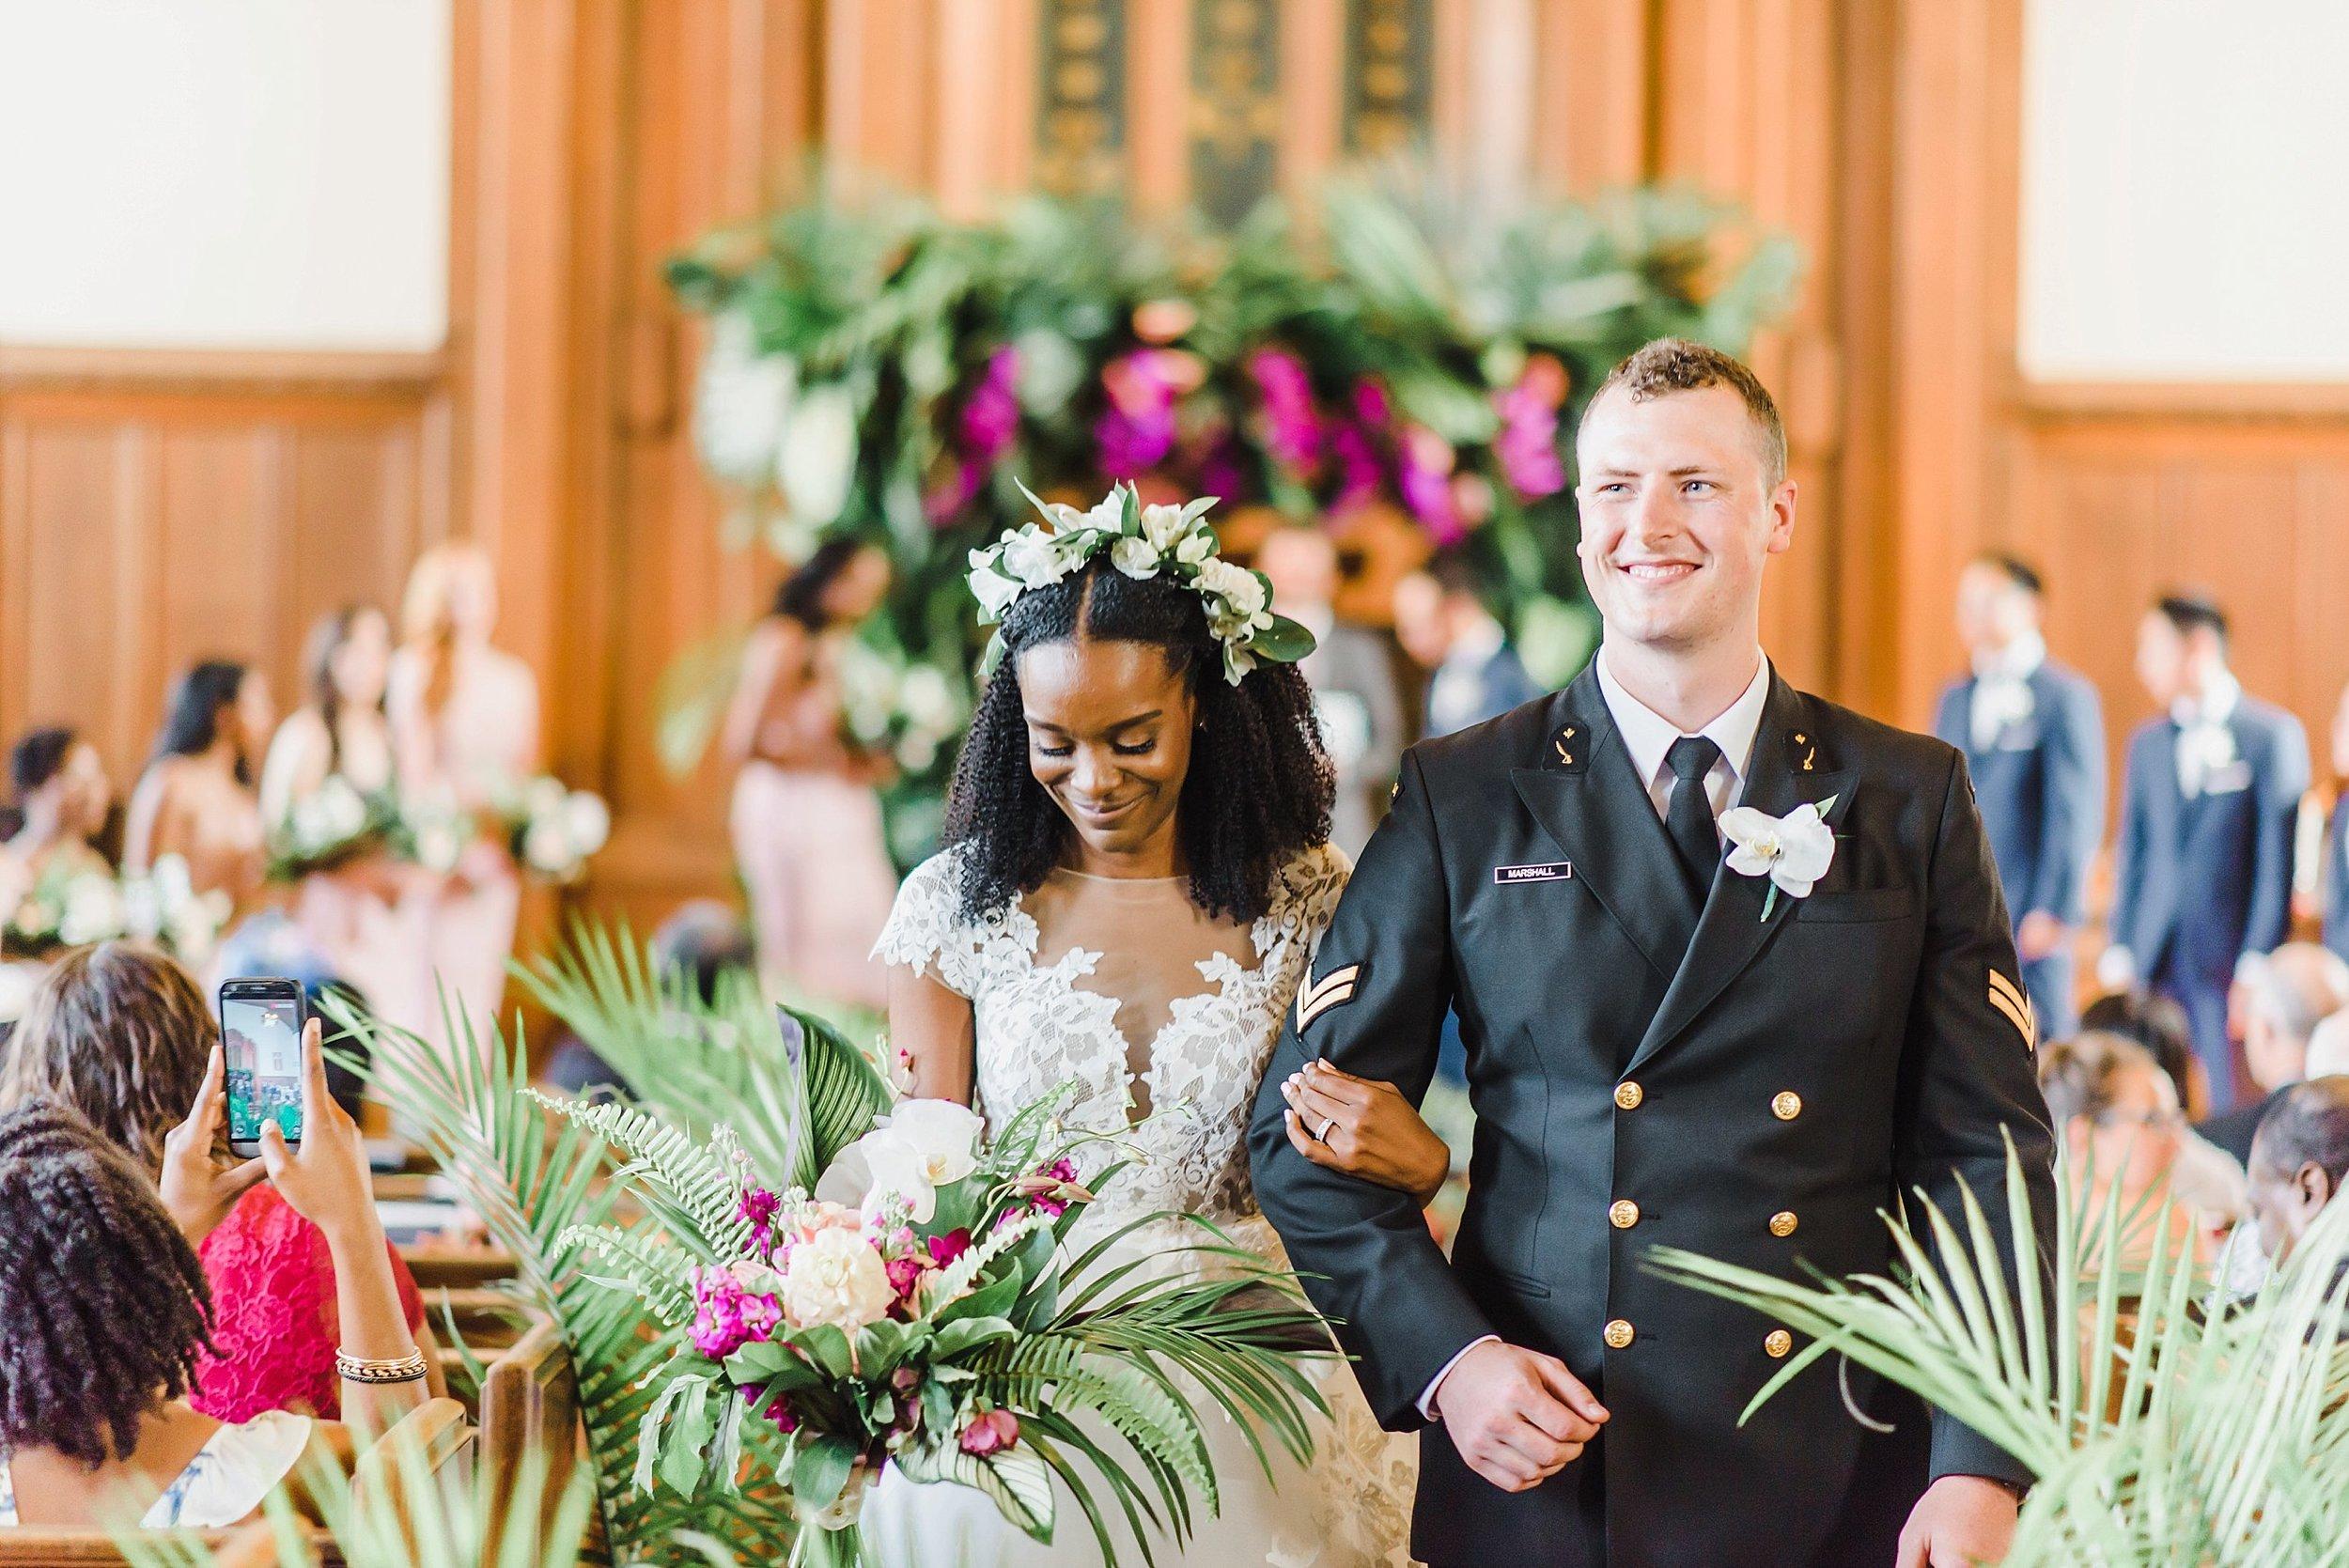 light airy indie fine art ottawa wedding photographer | Ali and Batoul Photography_0979.jpg